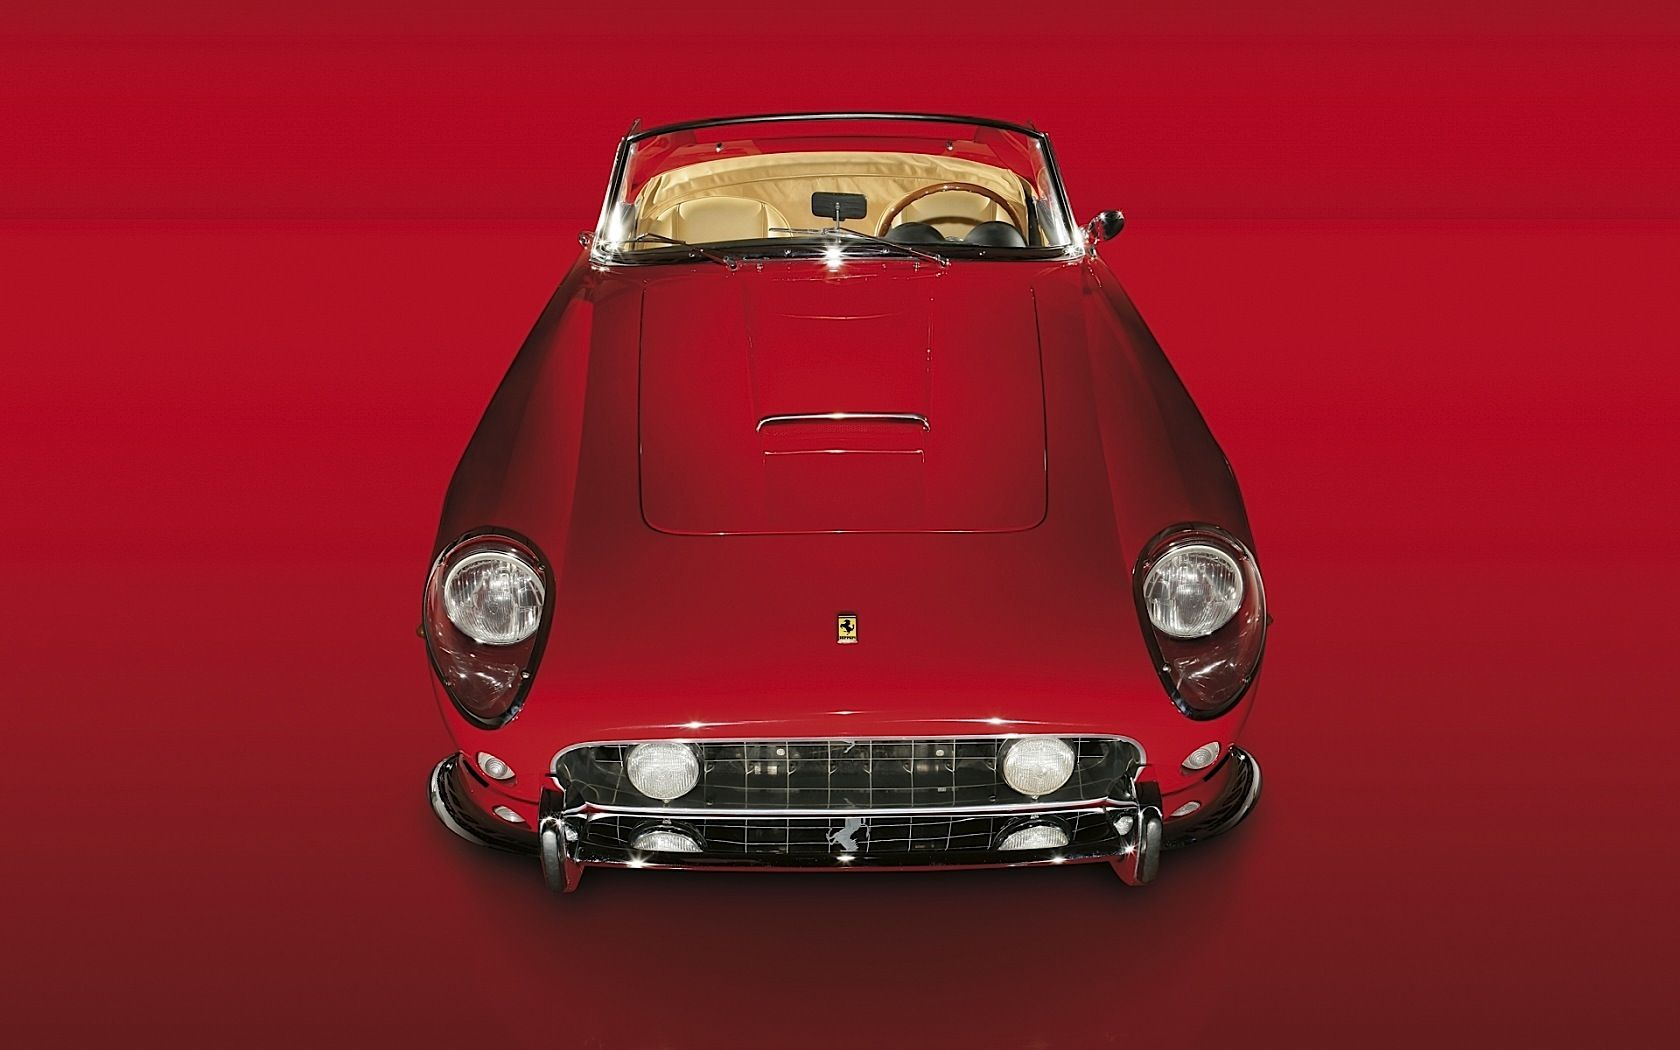 1957 Ferrari 250 GT LWB California Spyder Ferrari